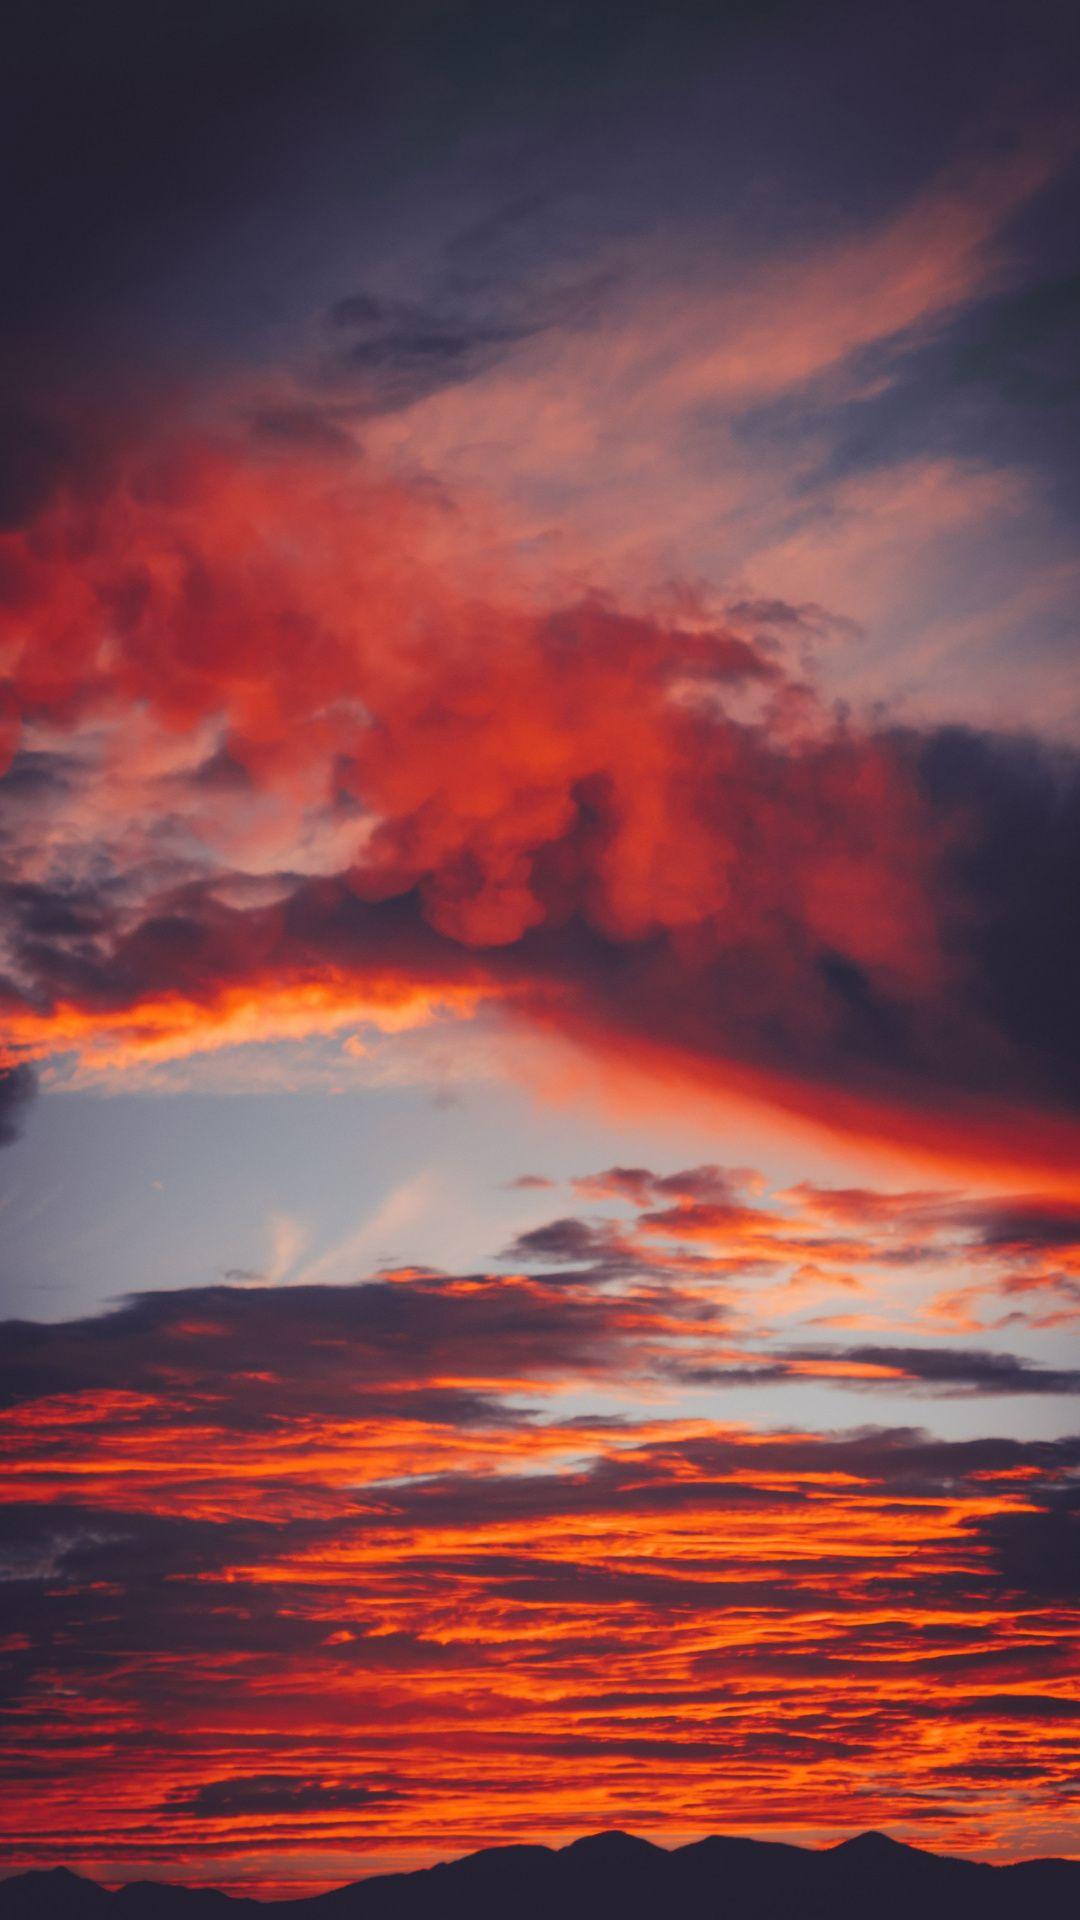 Colorful Clouds Orange Sunset 1080x1920 Wallpaper Sky And Clouds Clouds Sky Hd wallpaper sky clouds sunset dusk